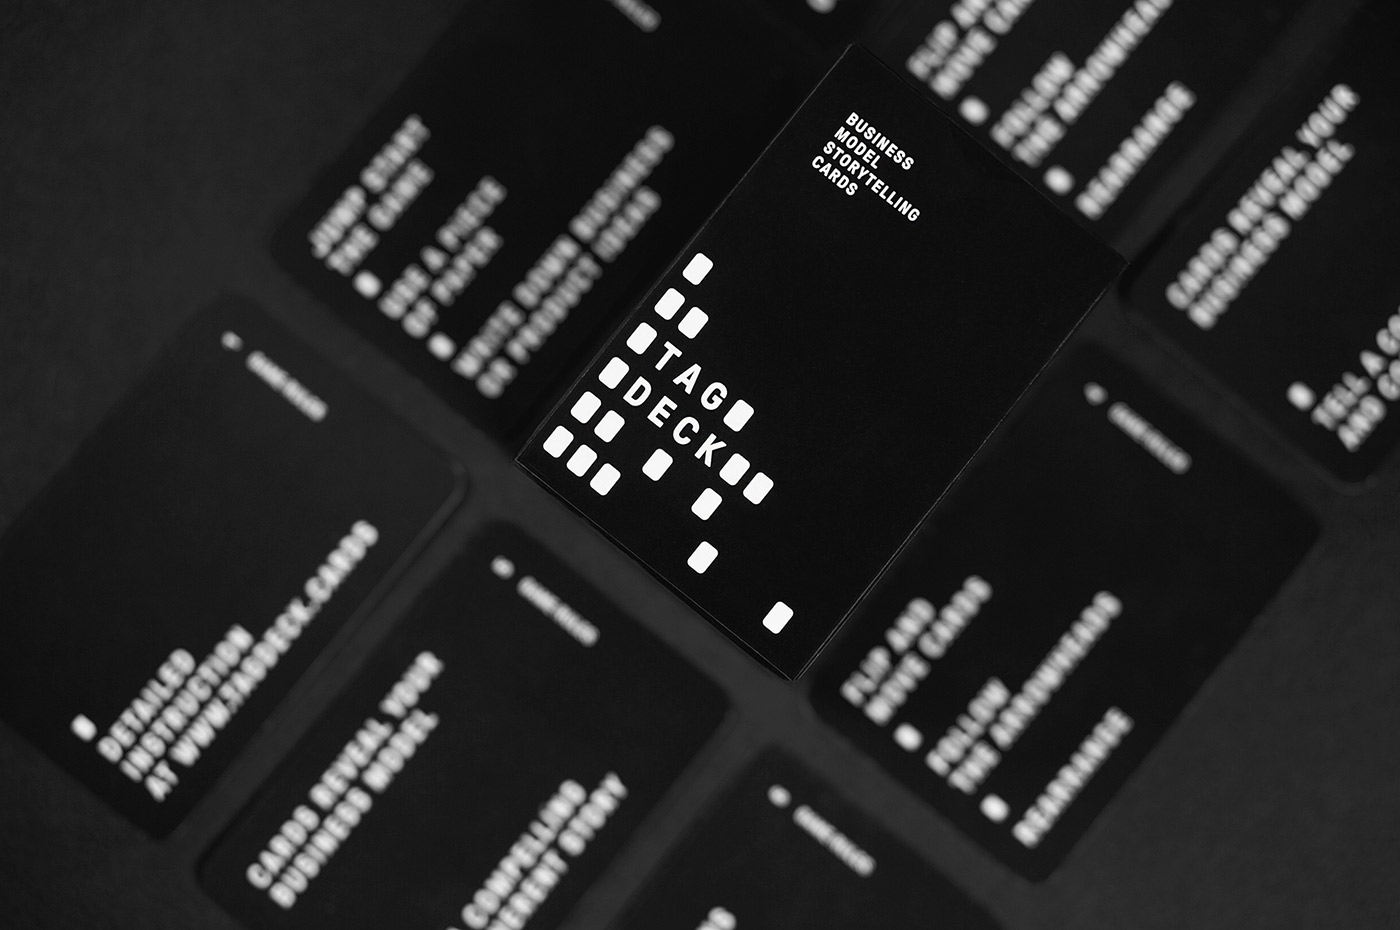 TagDeck - Business Cards & Graphic Design Inspiration